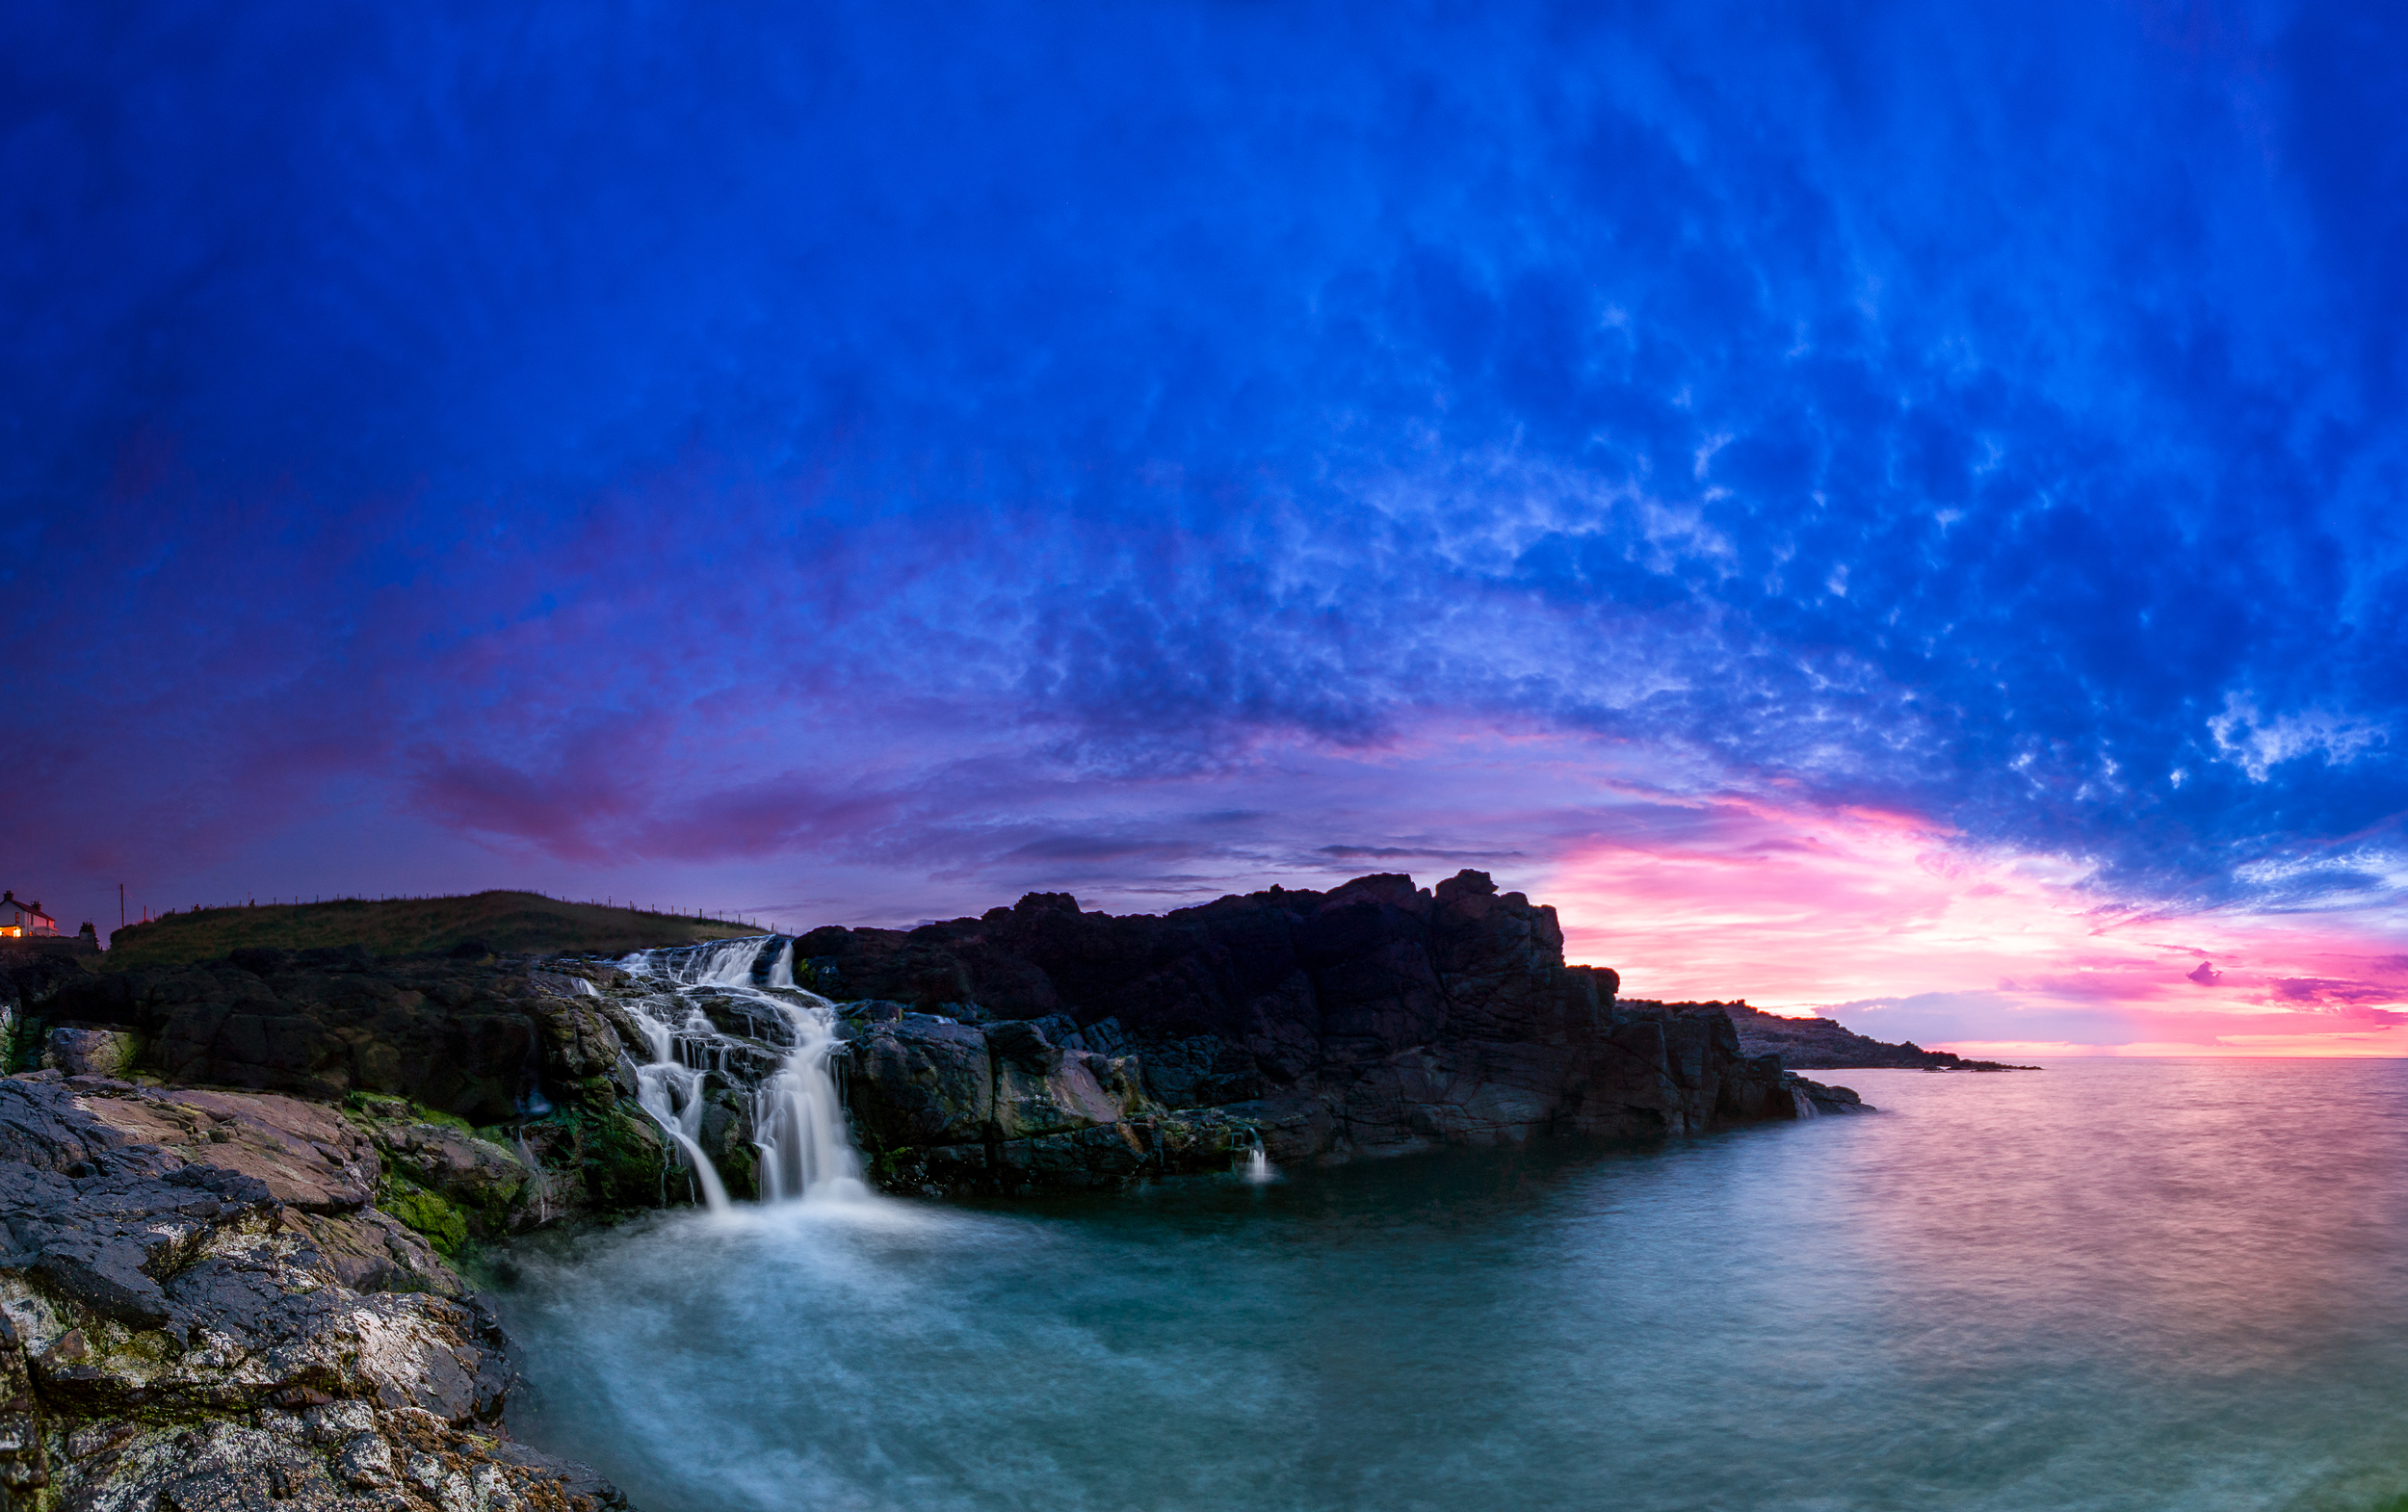 waterfall dunseveric-3.jpg